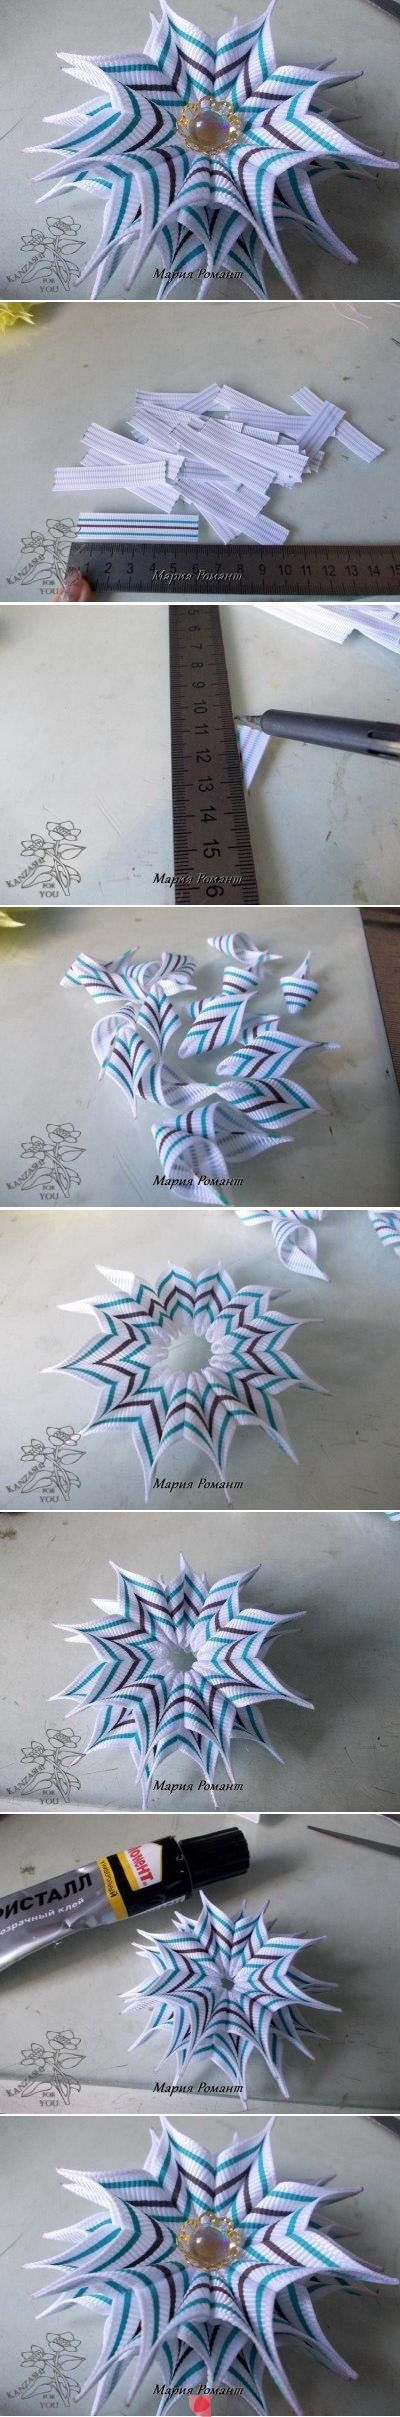 fabric decoration #milliinery #judithm #hats More